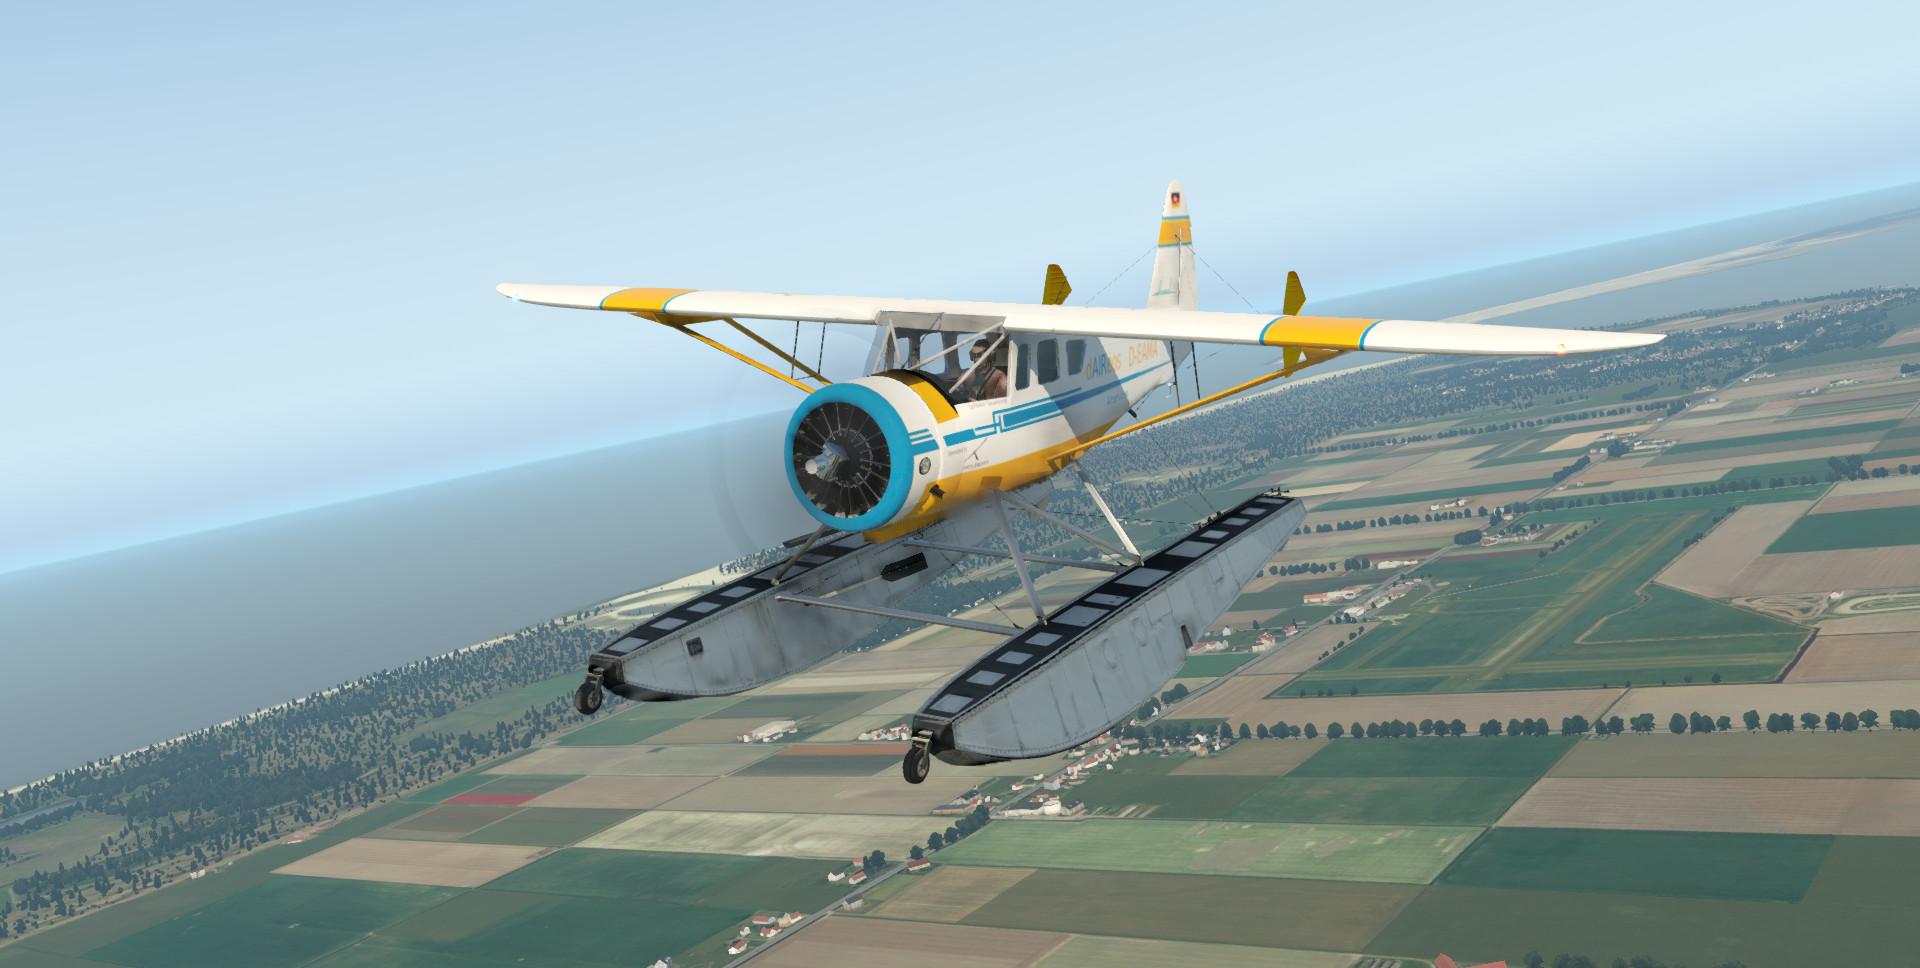 nordseerundflug-036lck0c.jpg